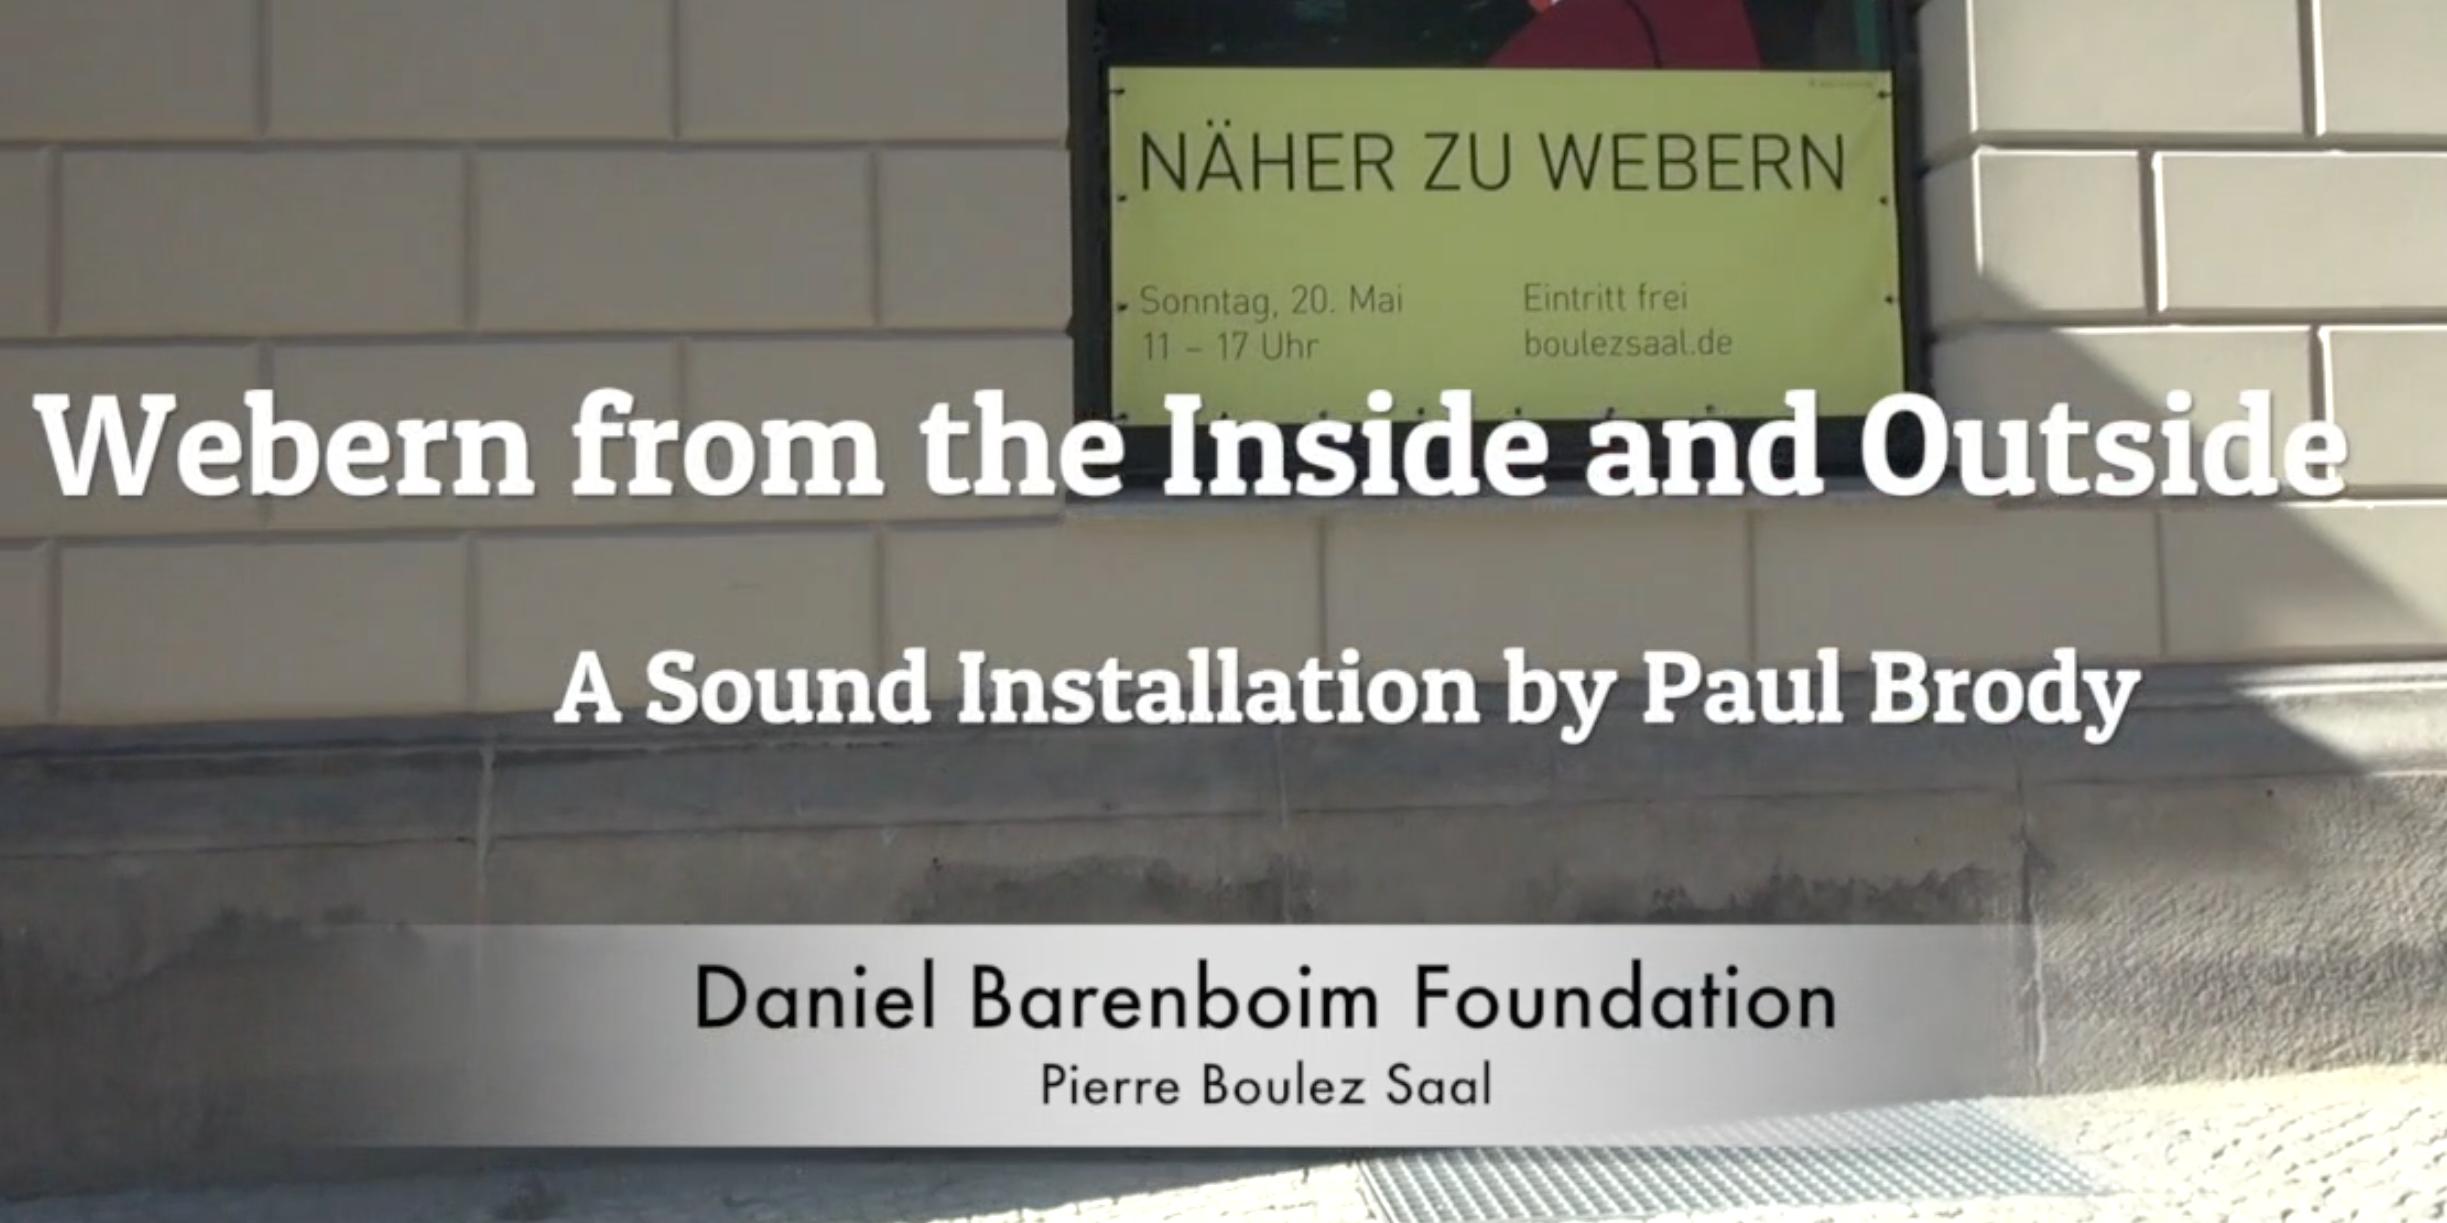 Daniel Barenboim Foundation: Pierre Boulez Saal Sound Installation